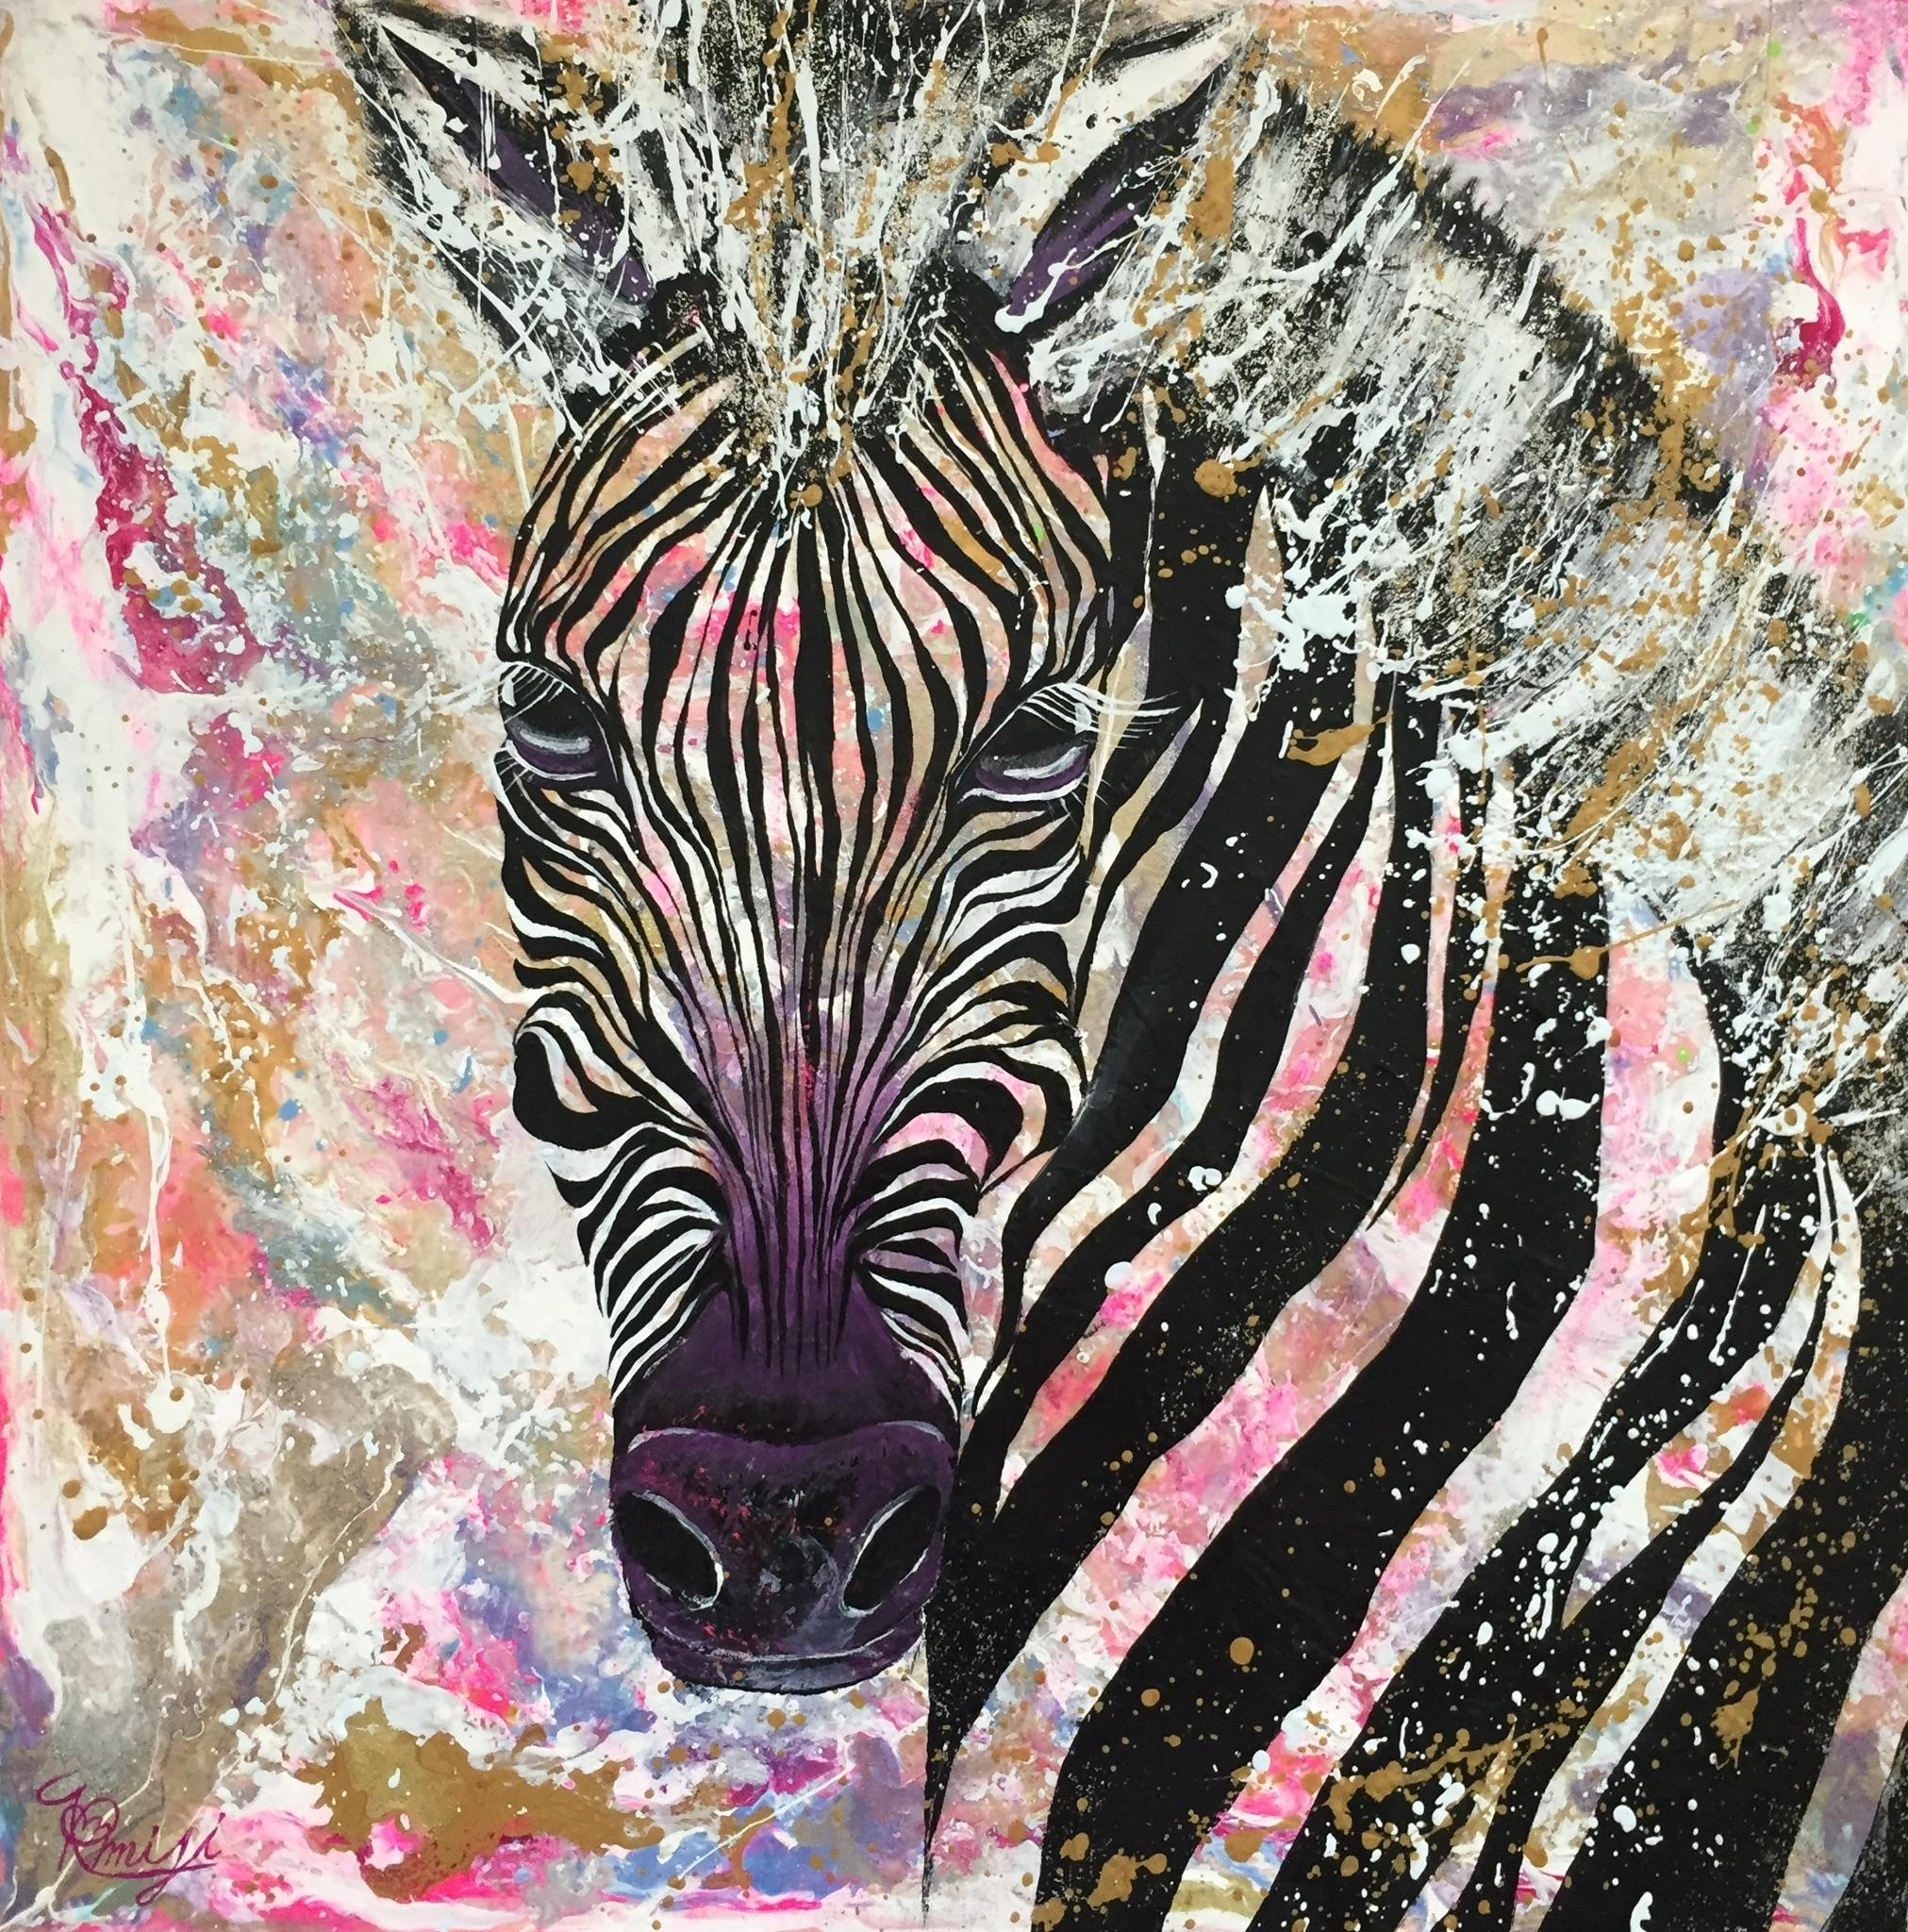 『parhelion』  acrylic on canvas ( 45.5×45.5cm/ S8号)    第24回 アートムーブコンクール ダイム賞受賞